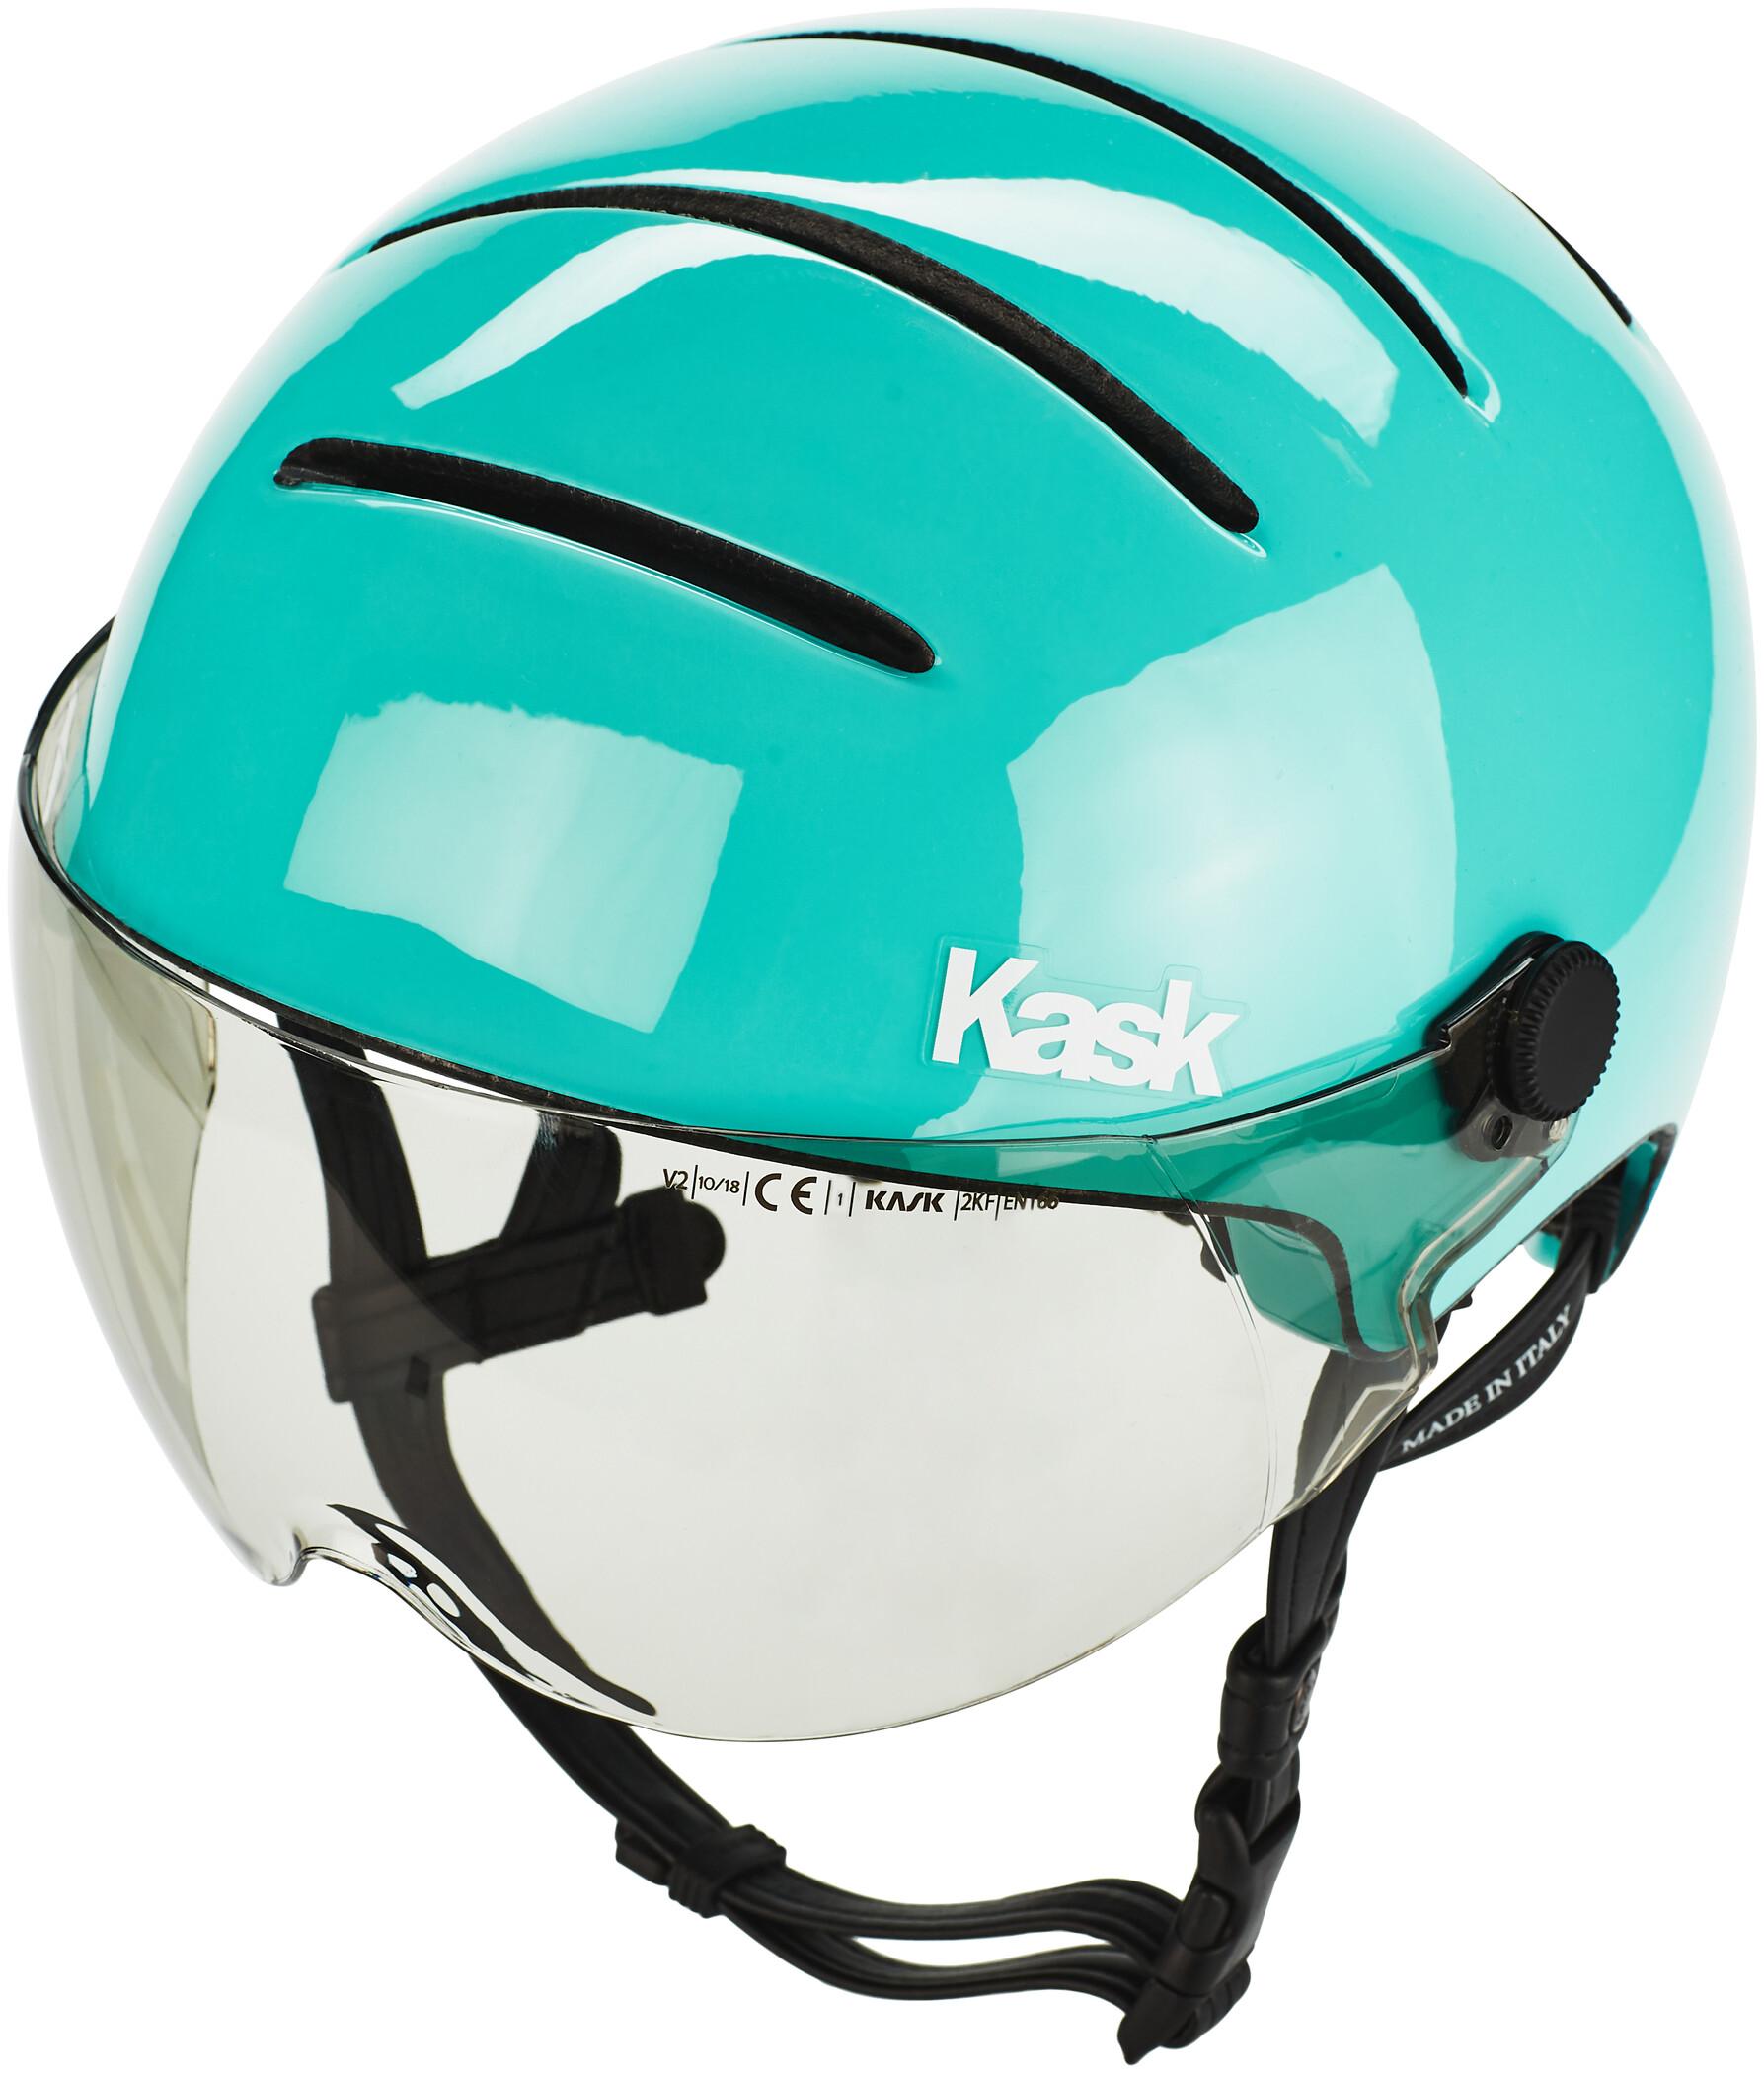 Kask Lifestyle Cykelhjelm inkl. visir, light blue (2019) | Hjelme